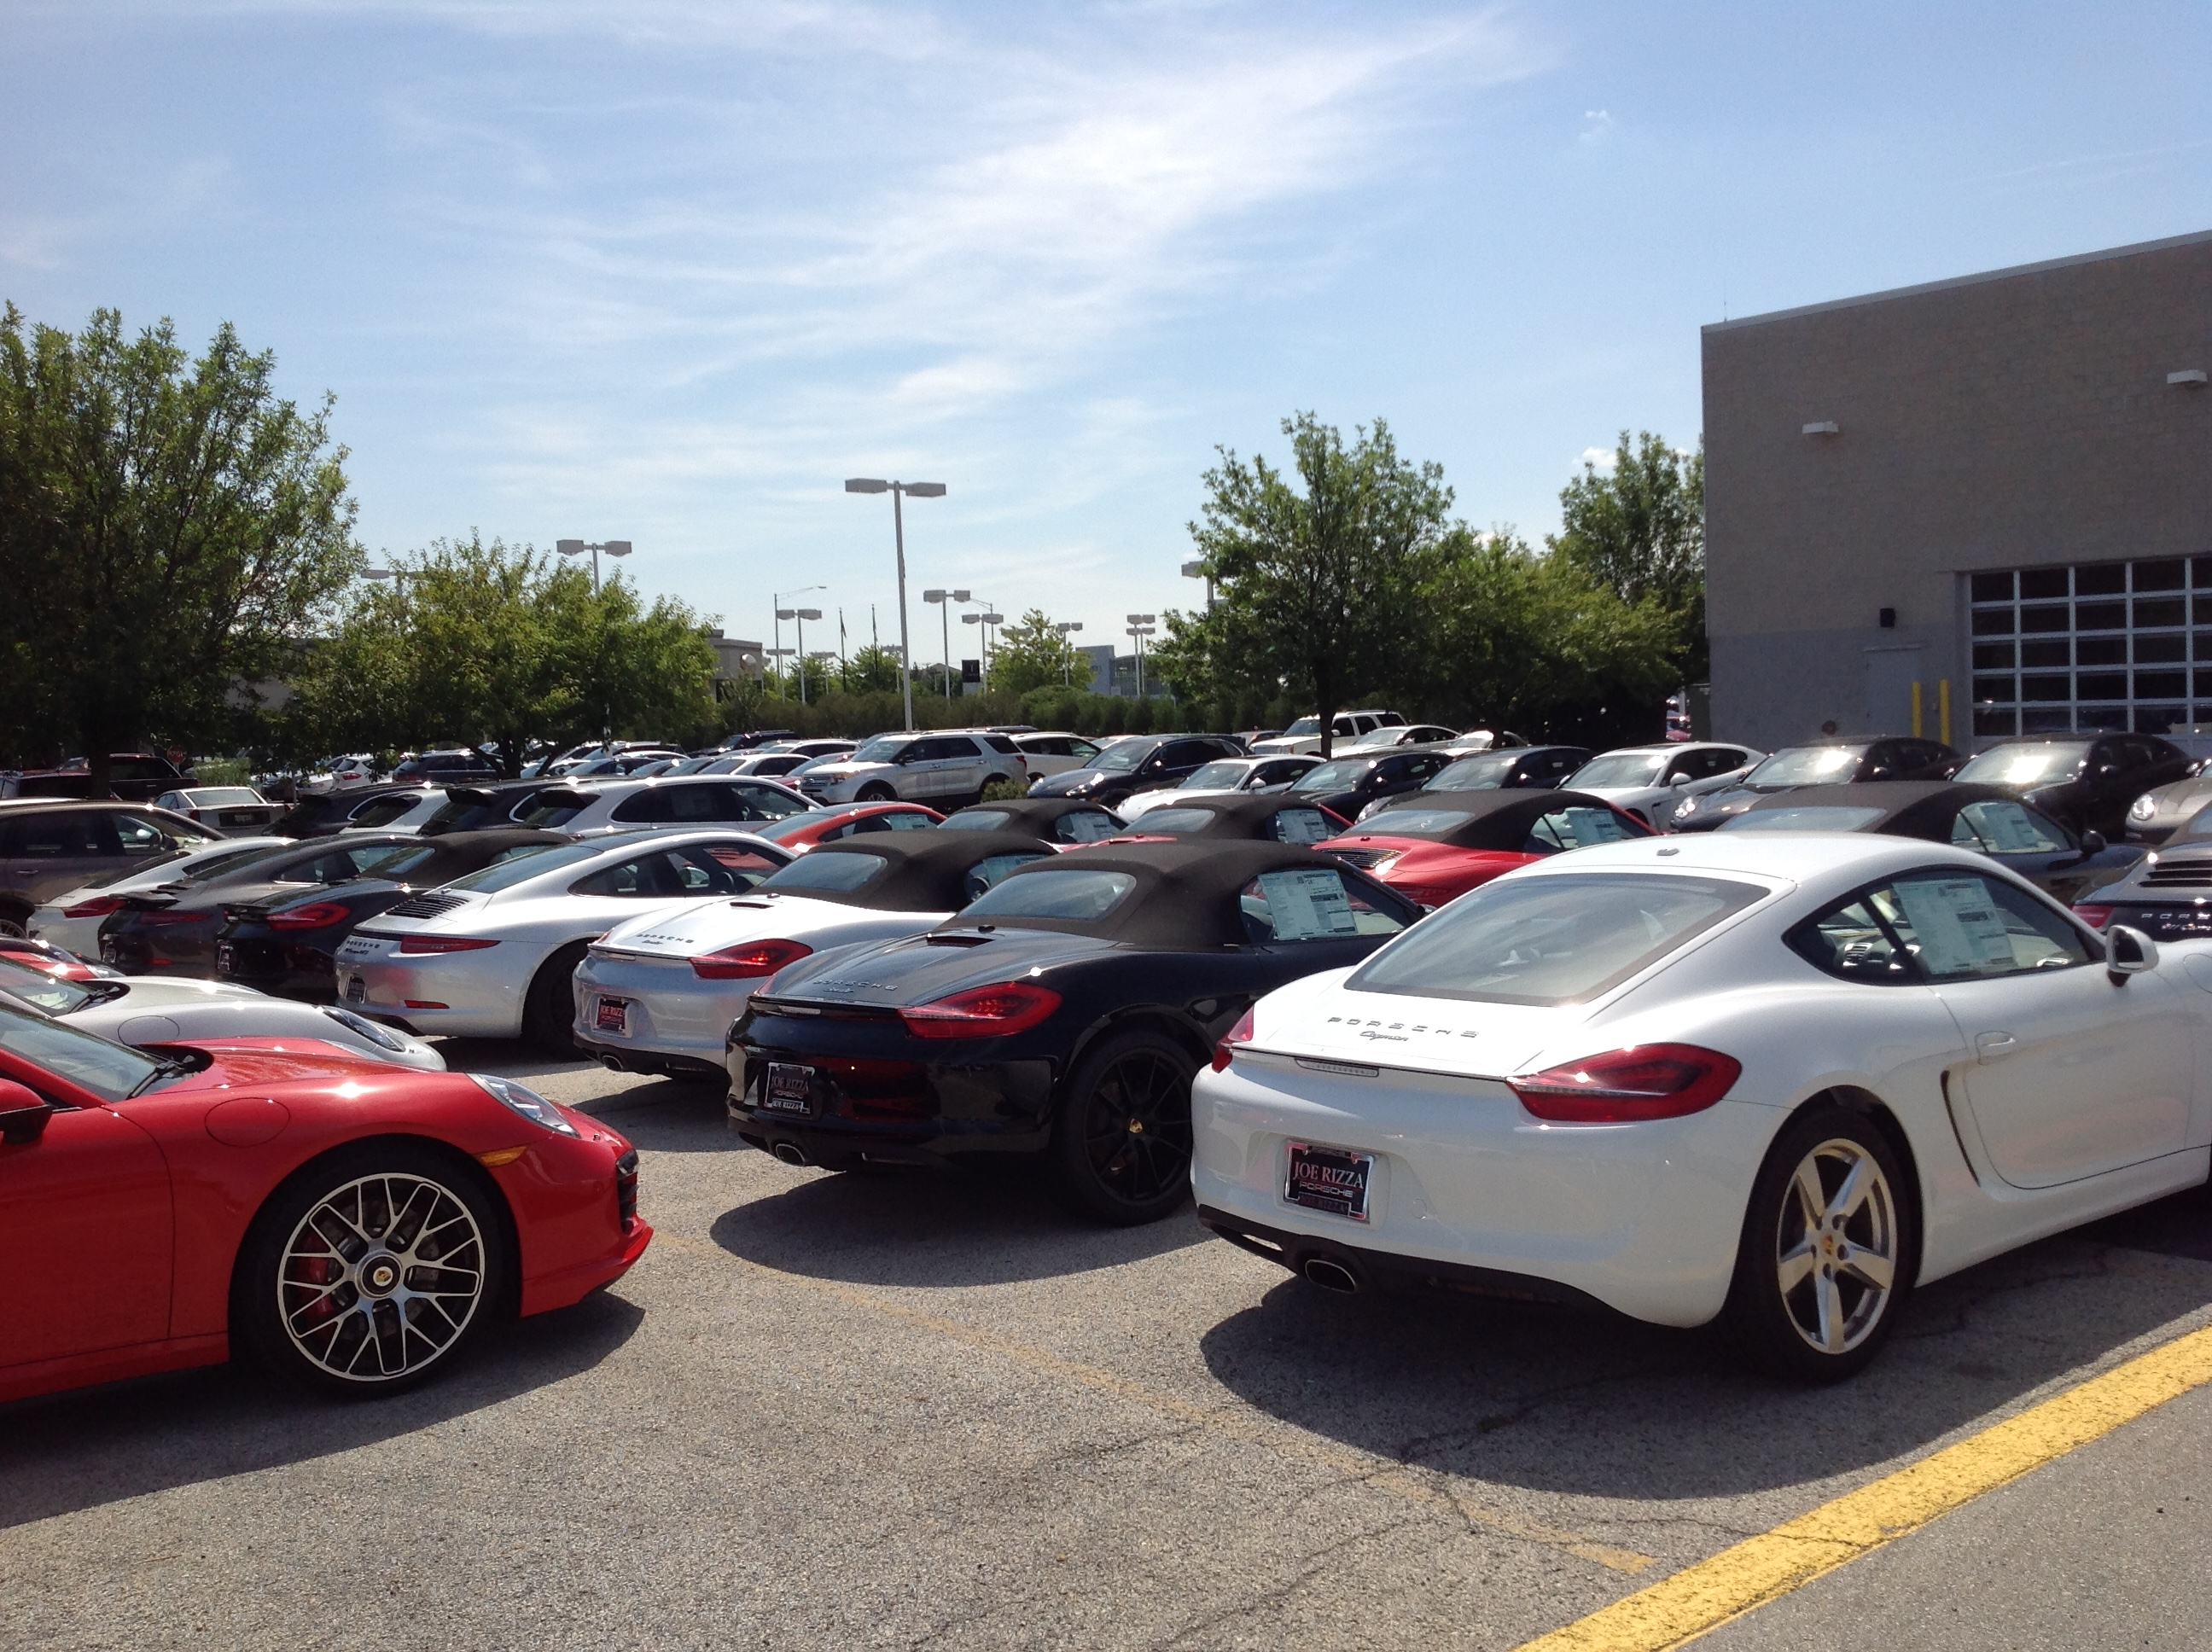 Acura Orland Park >> Porsche Orland Park: A Joe Rizza Dealership, Orland Park ...